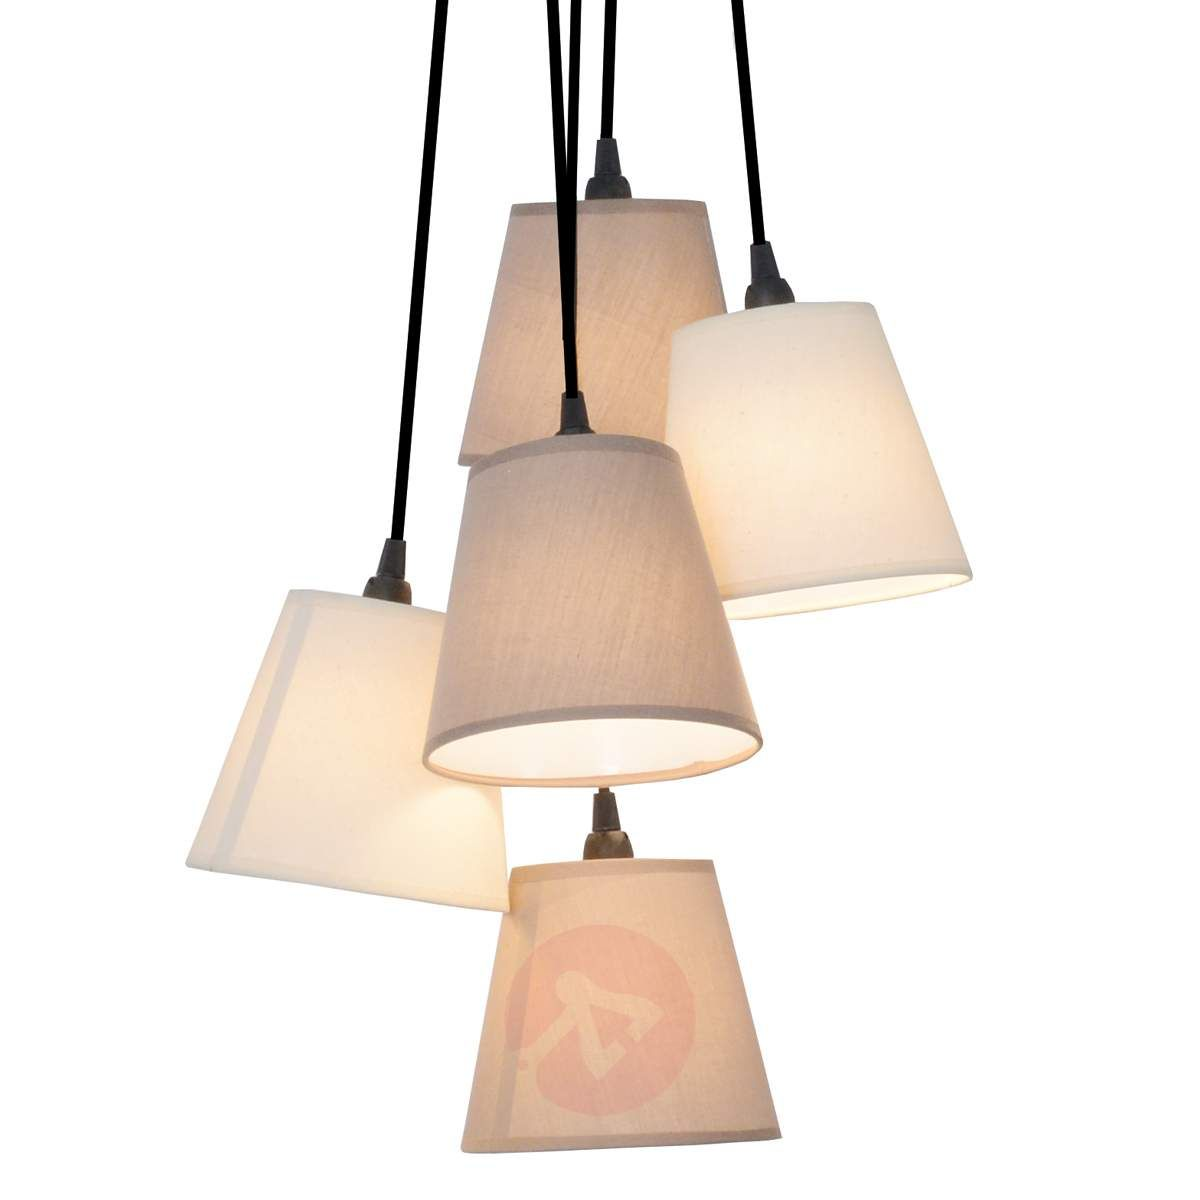 Twiddle Tekstylna Lampa Wiszaca Piec Kloszy Pendant Lighting Hanging Lights Pendant Light